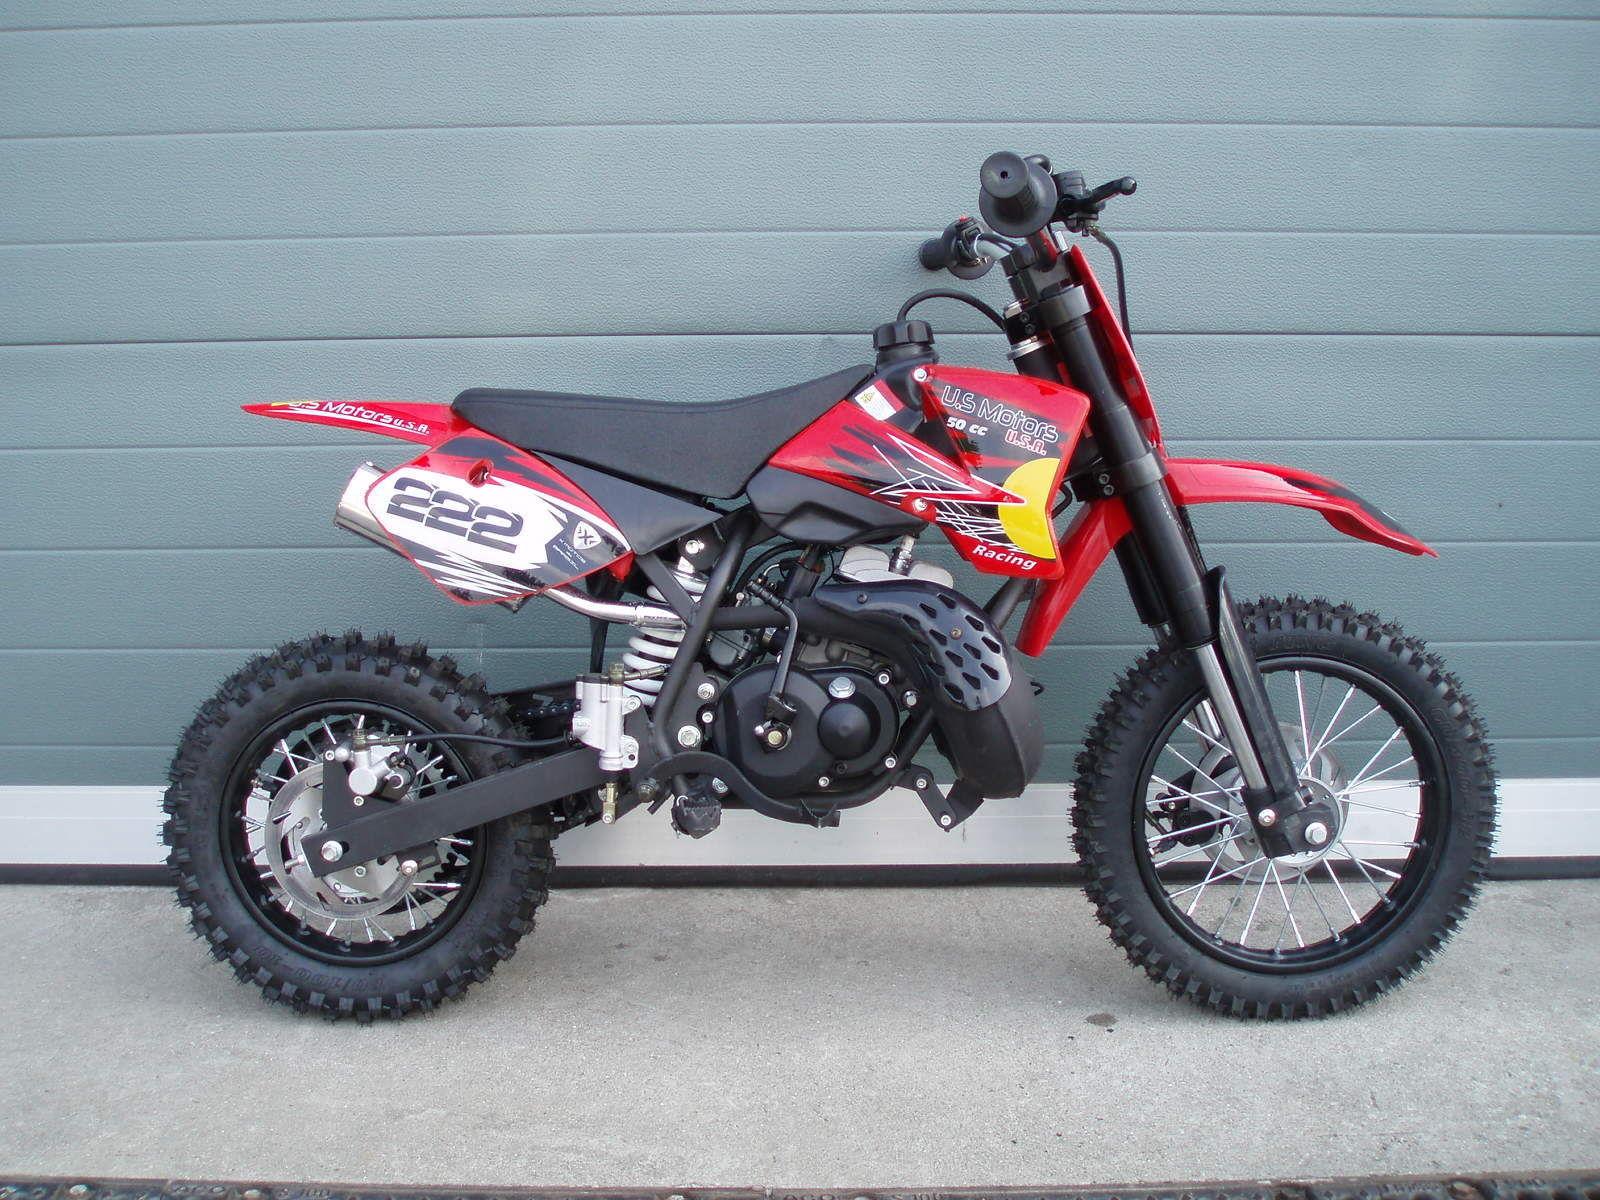 childrens childs kids 50cc mx motox motocross 2 stroke off. Black Bedroom Furniture Sets. Home Design Ideas